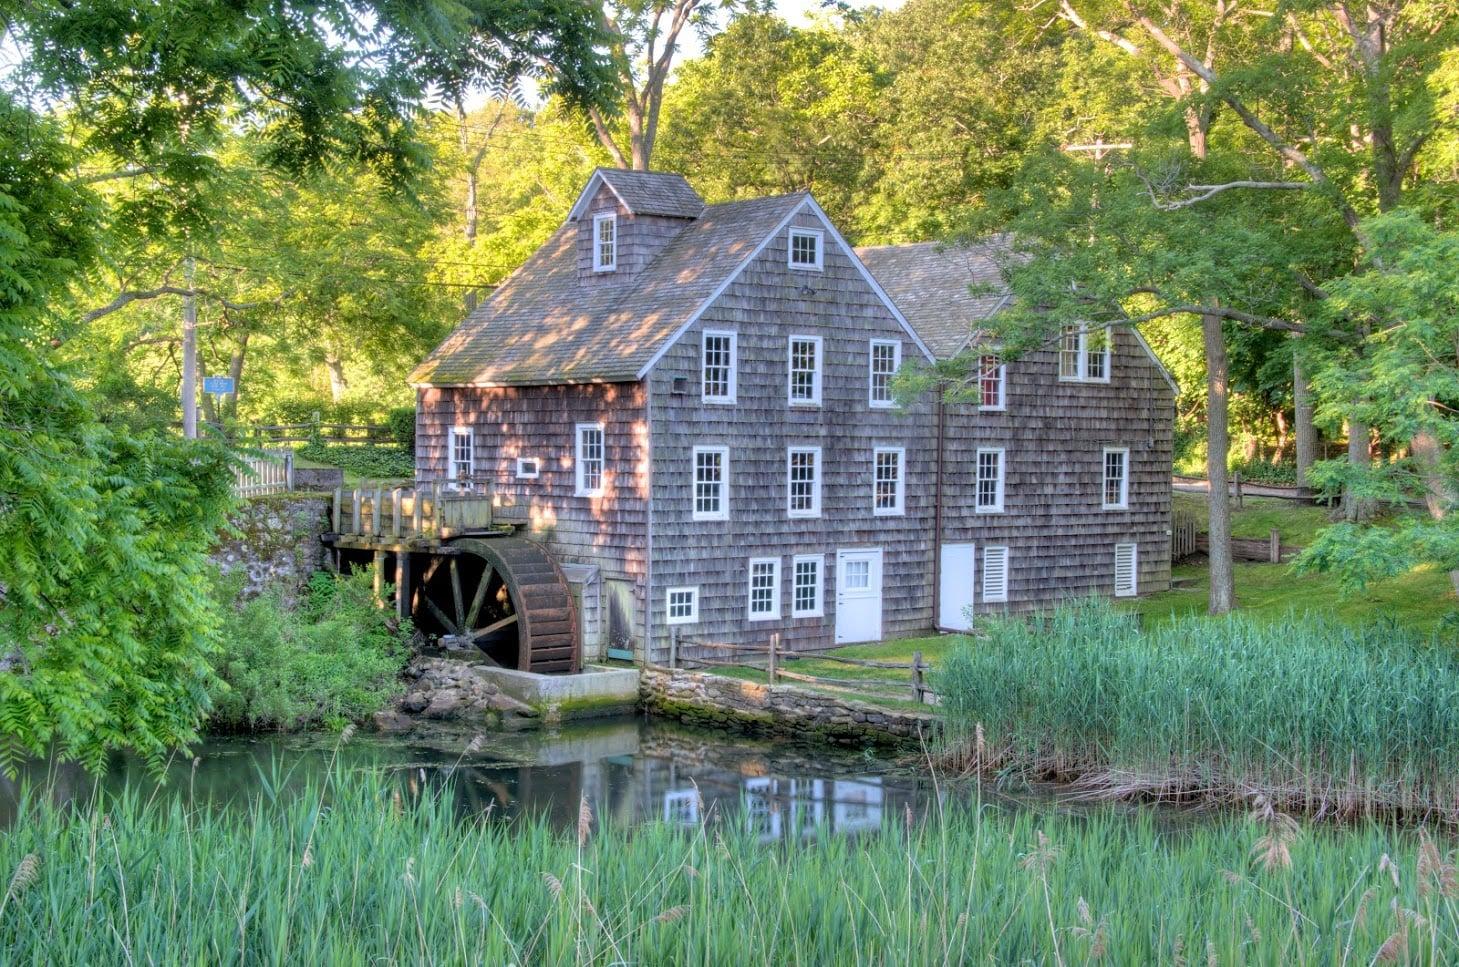 Stony Brook Grist Mill, Circa 1751